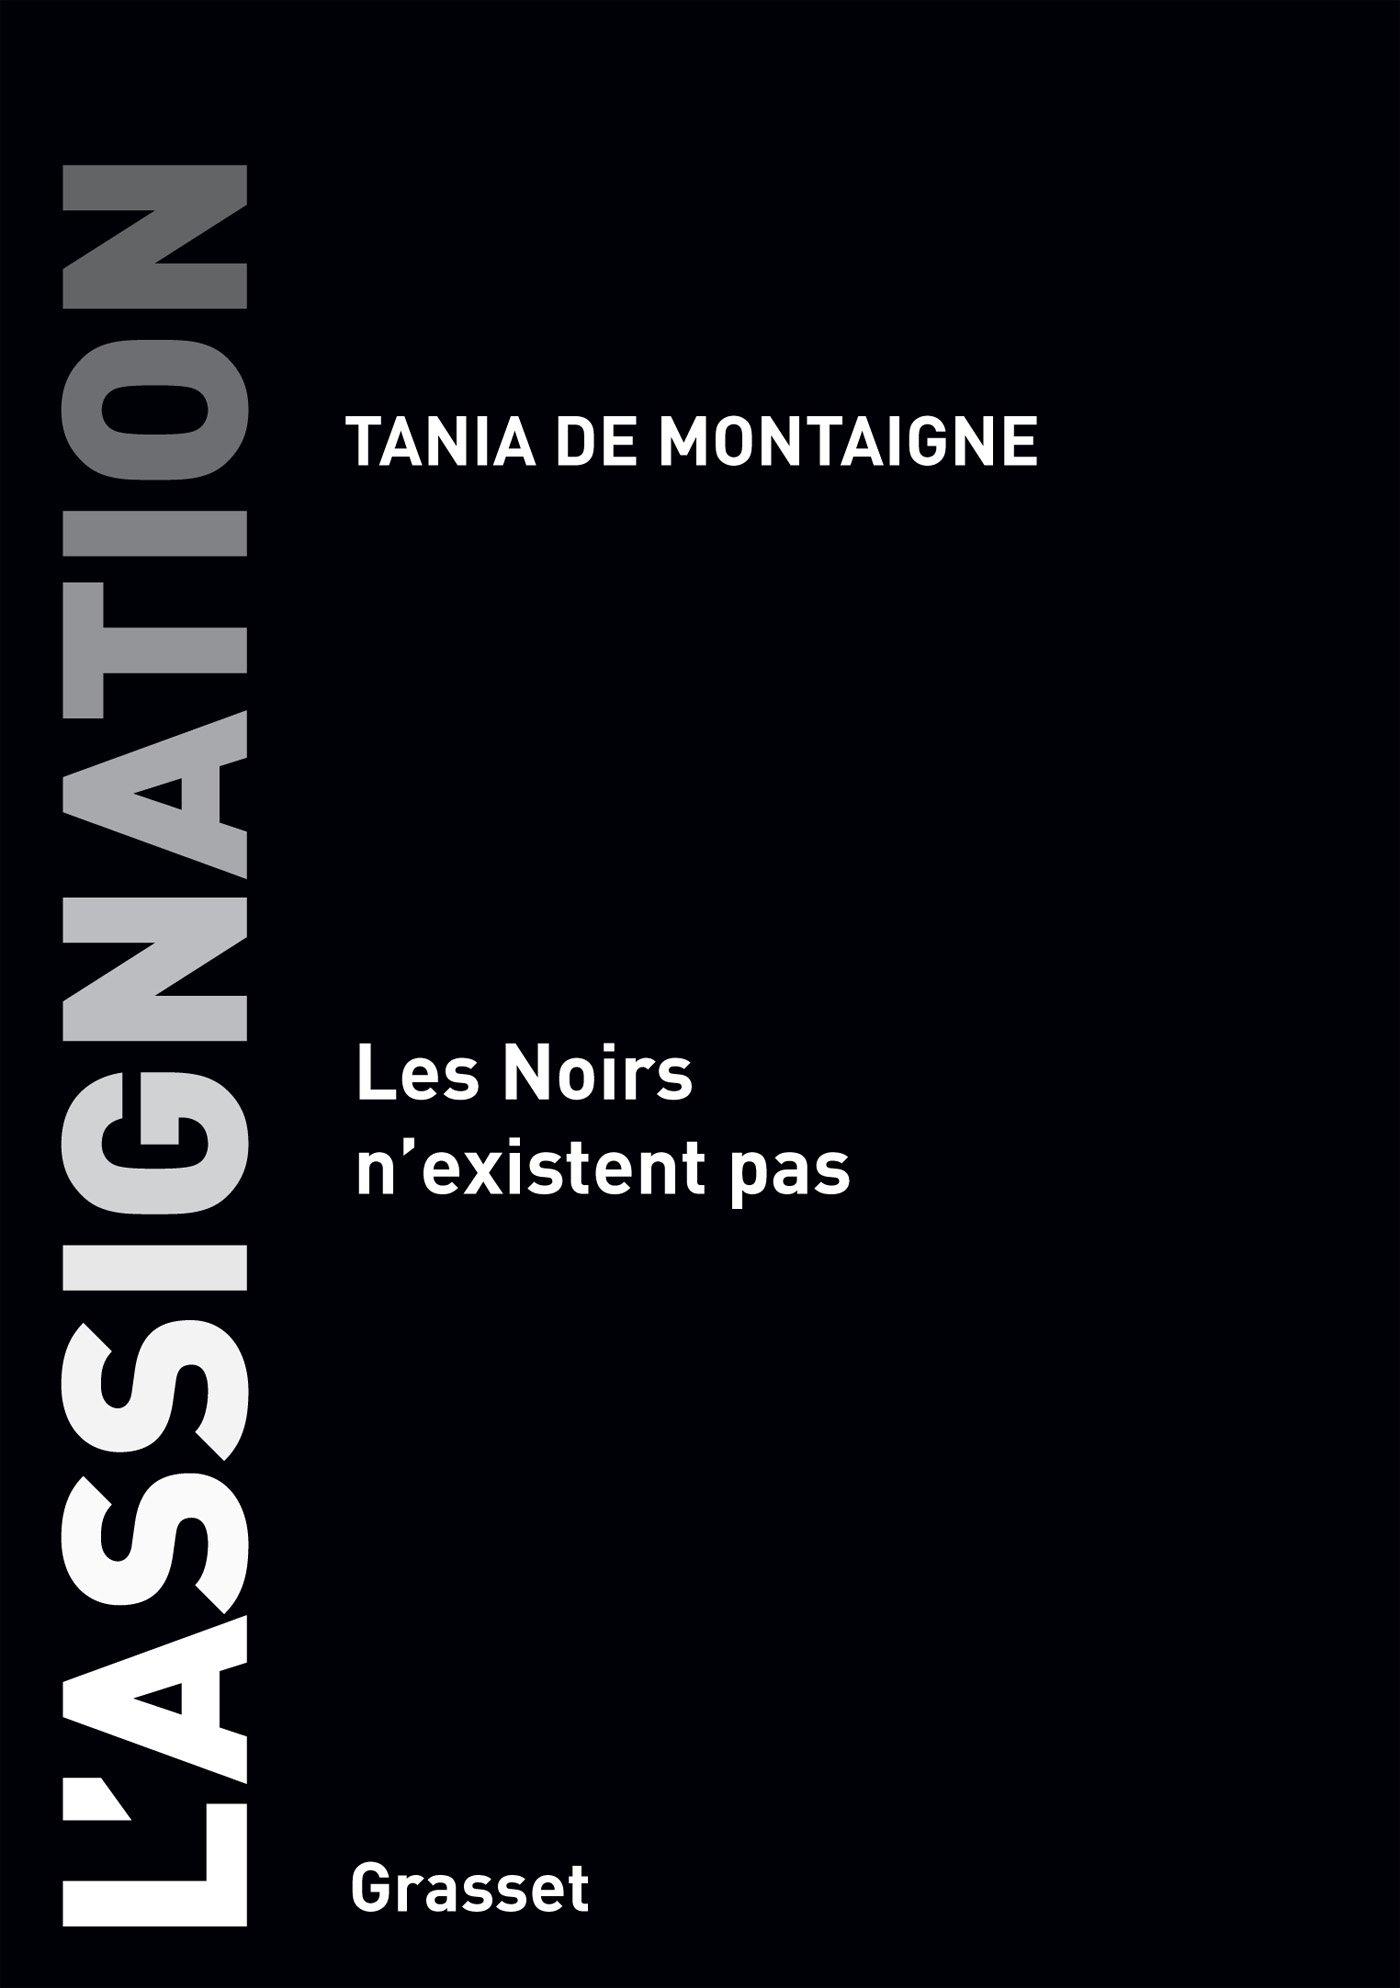 Tania de Montaigne 61wfj710